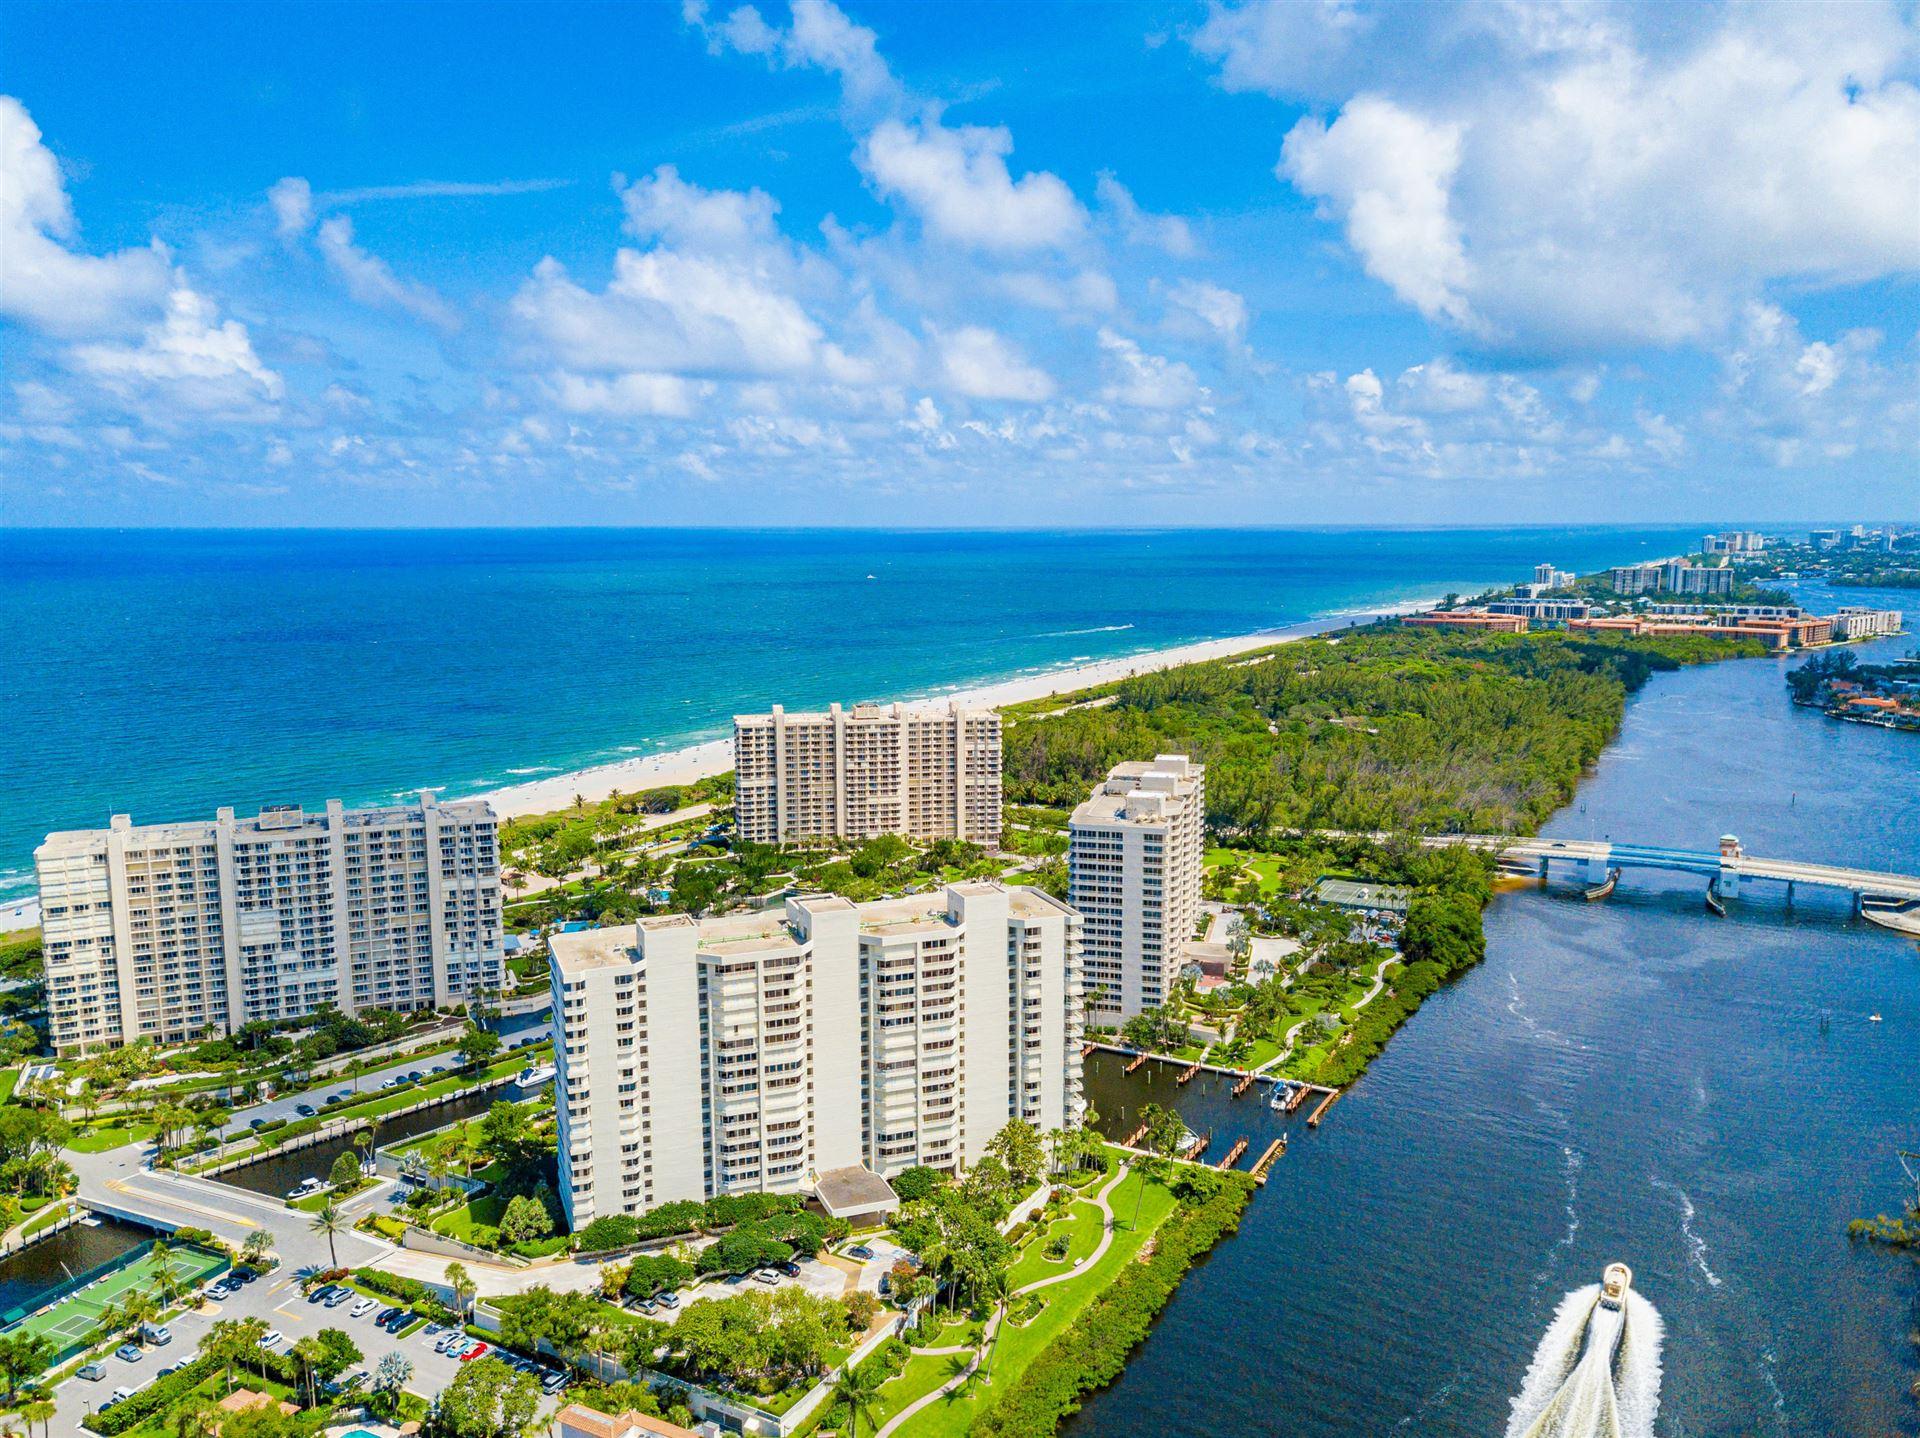 4201 N Ocean Boulevard #1002, Boca Raton, FL 33431 - #: RX-10627252